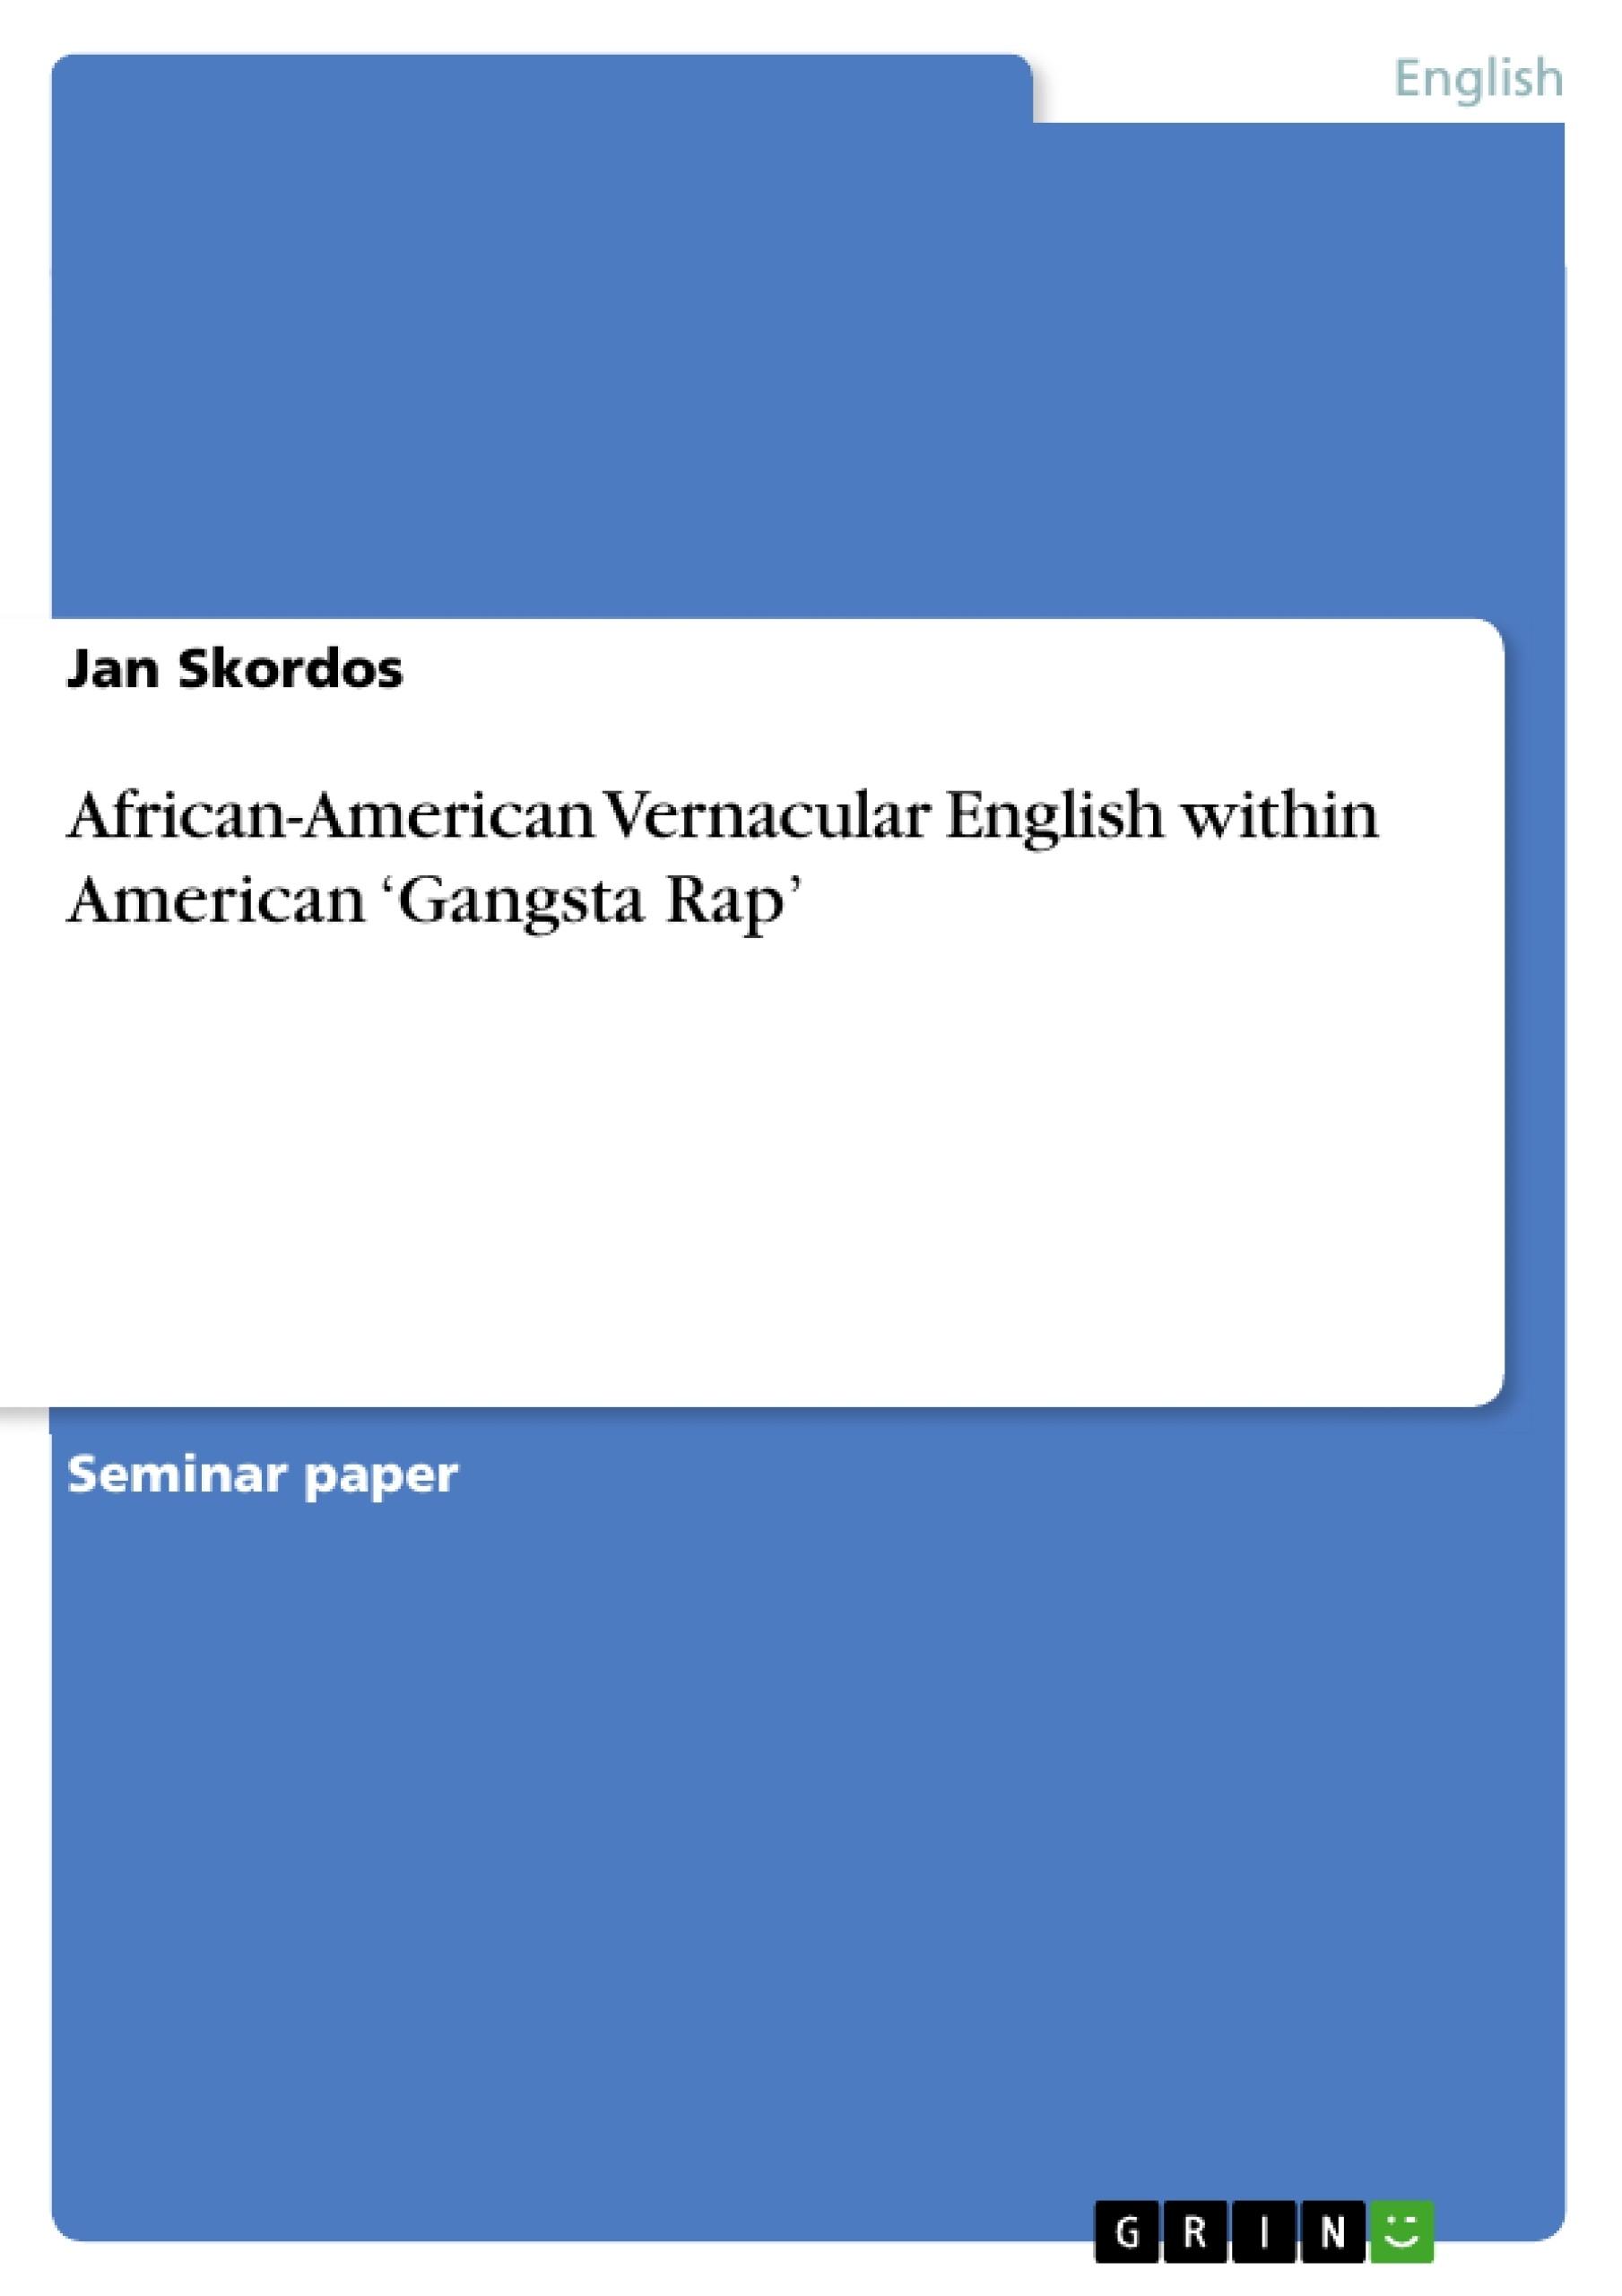 Title: African-American Vernacular English within American 'Gangsta Rap'